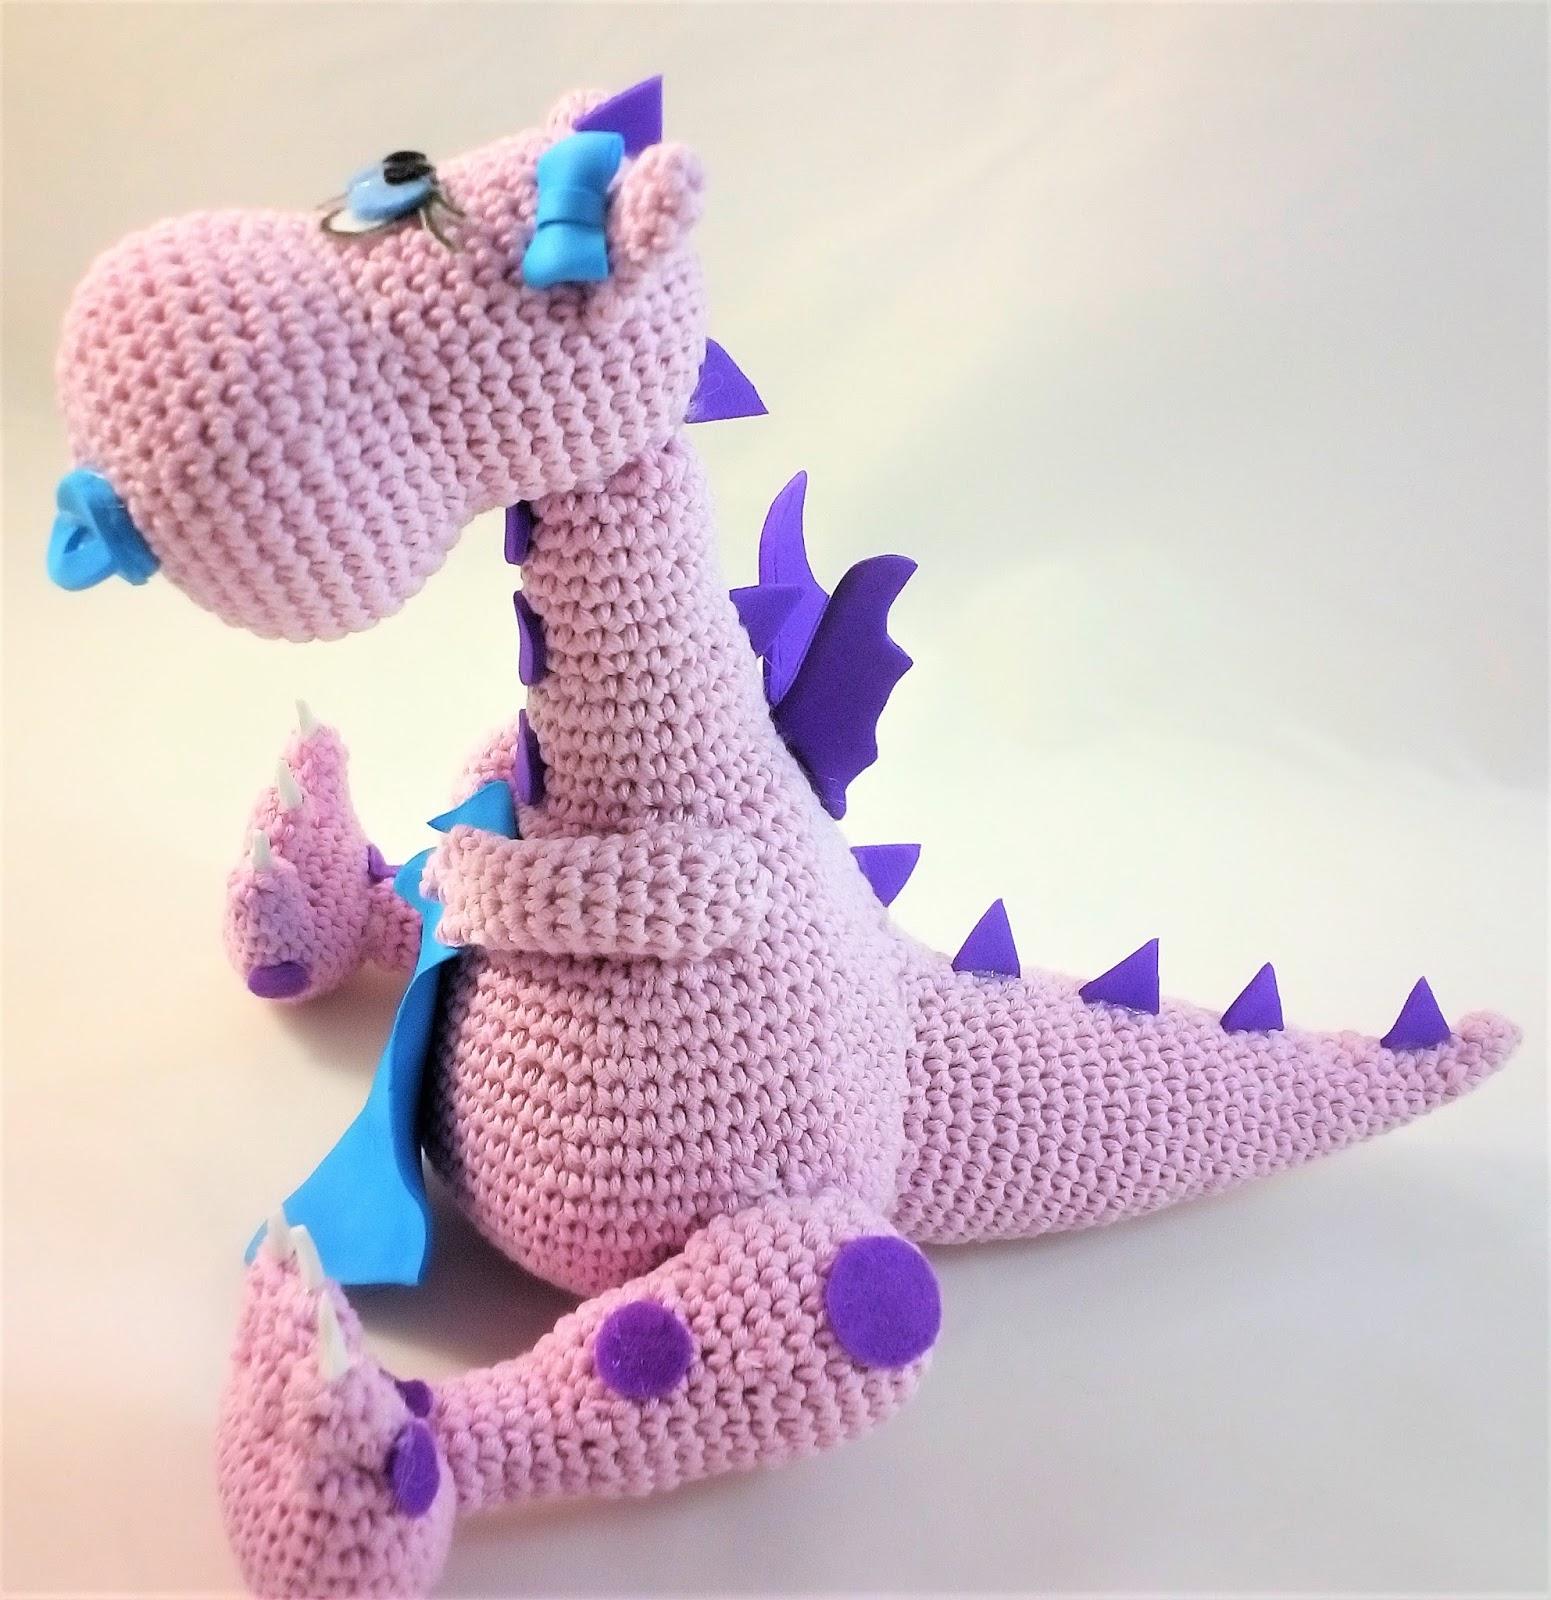 Amigurumi Crochet Presentation - LUNARYO baby dragon / smok - YouTube | 1600x1551